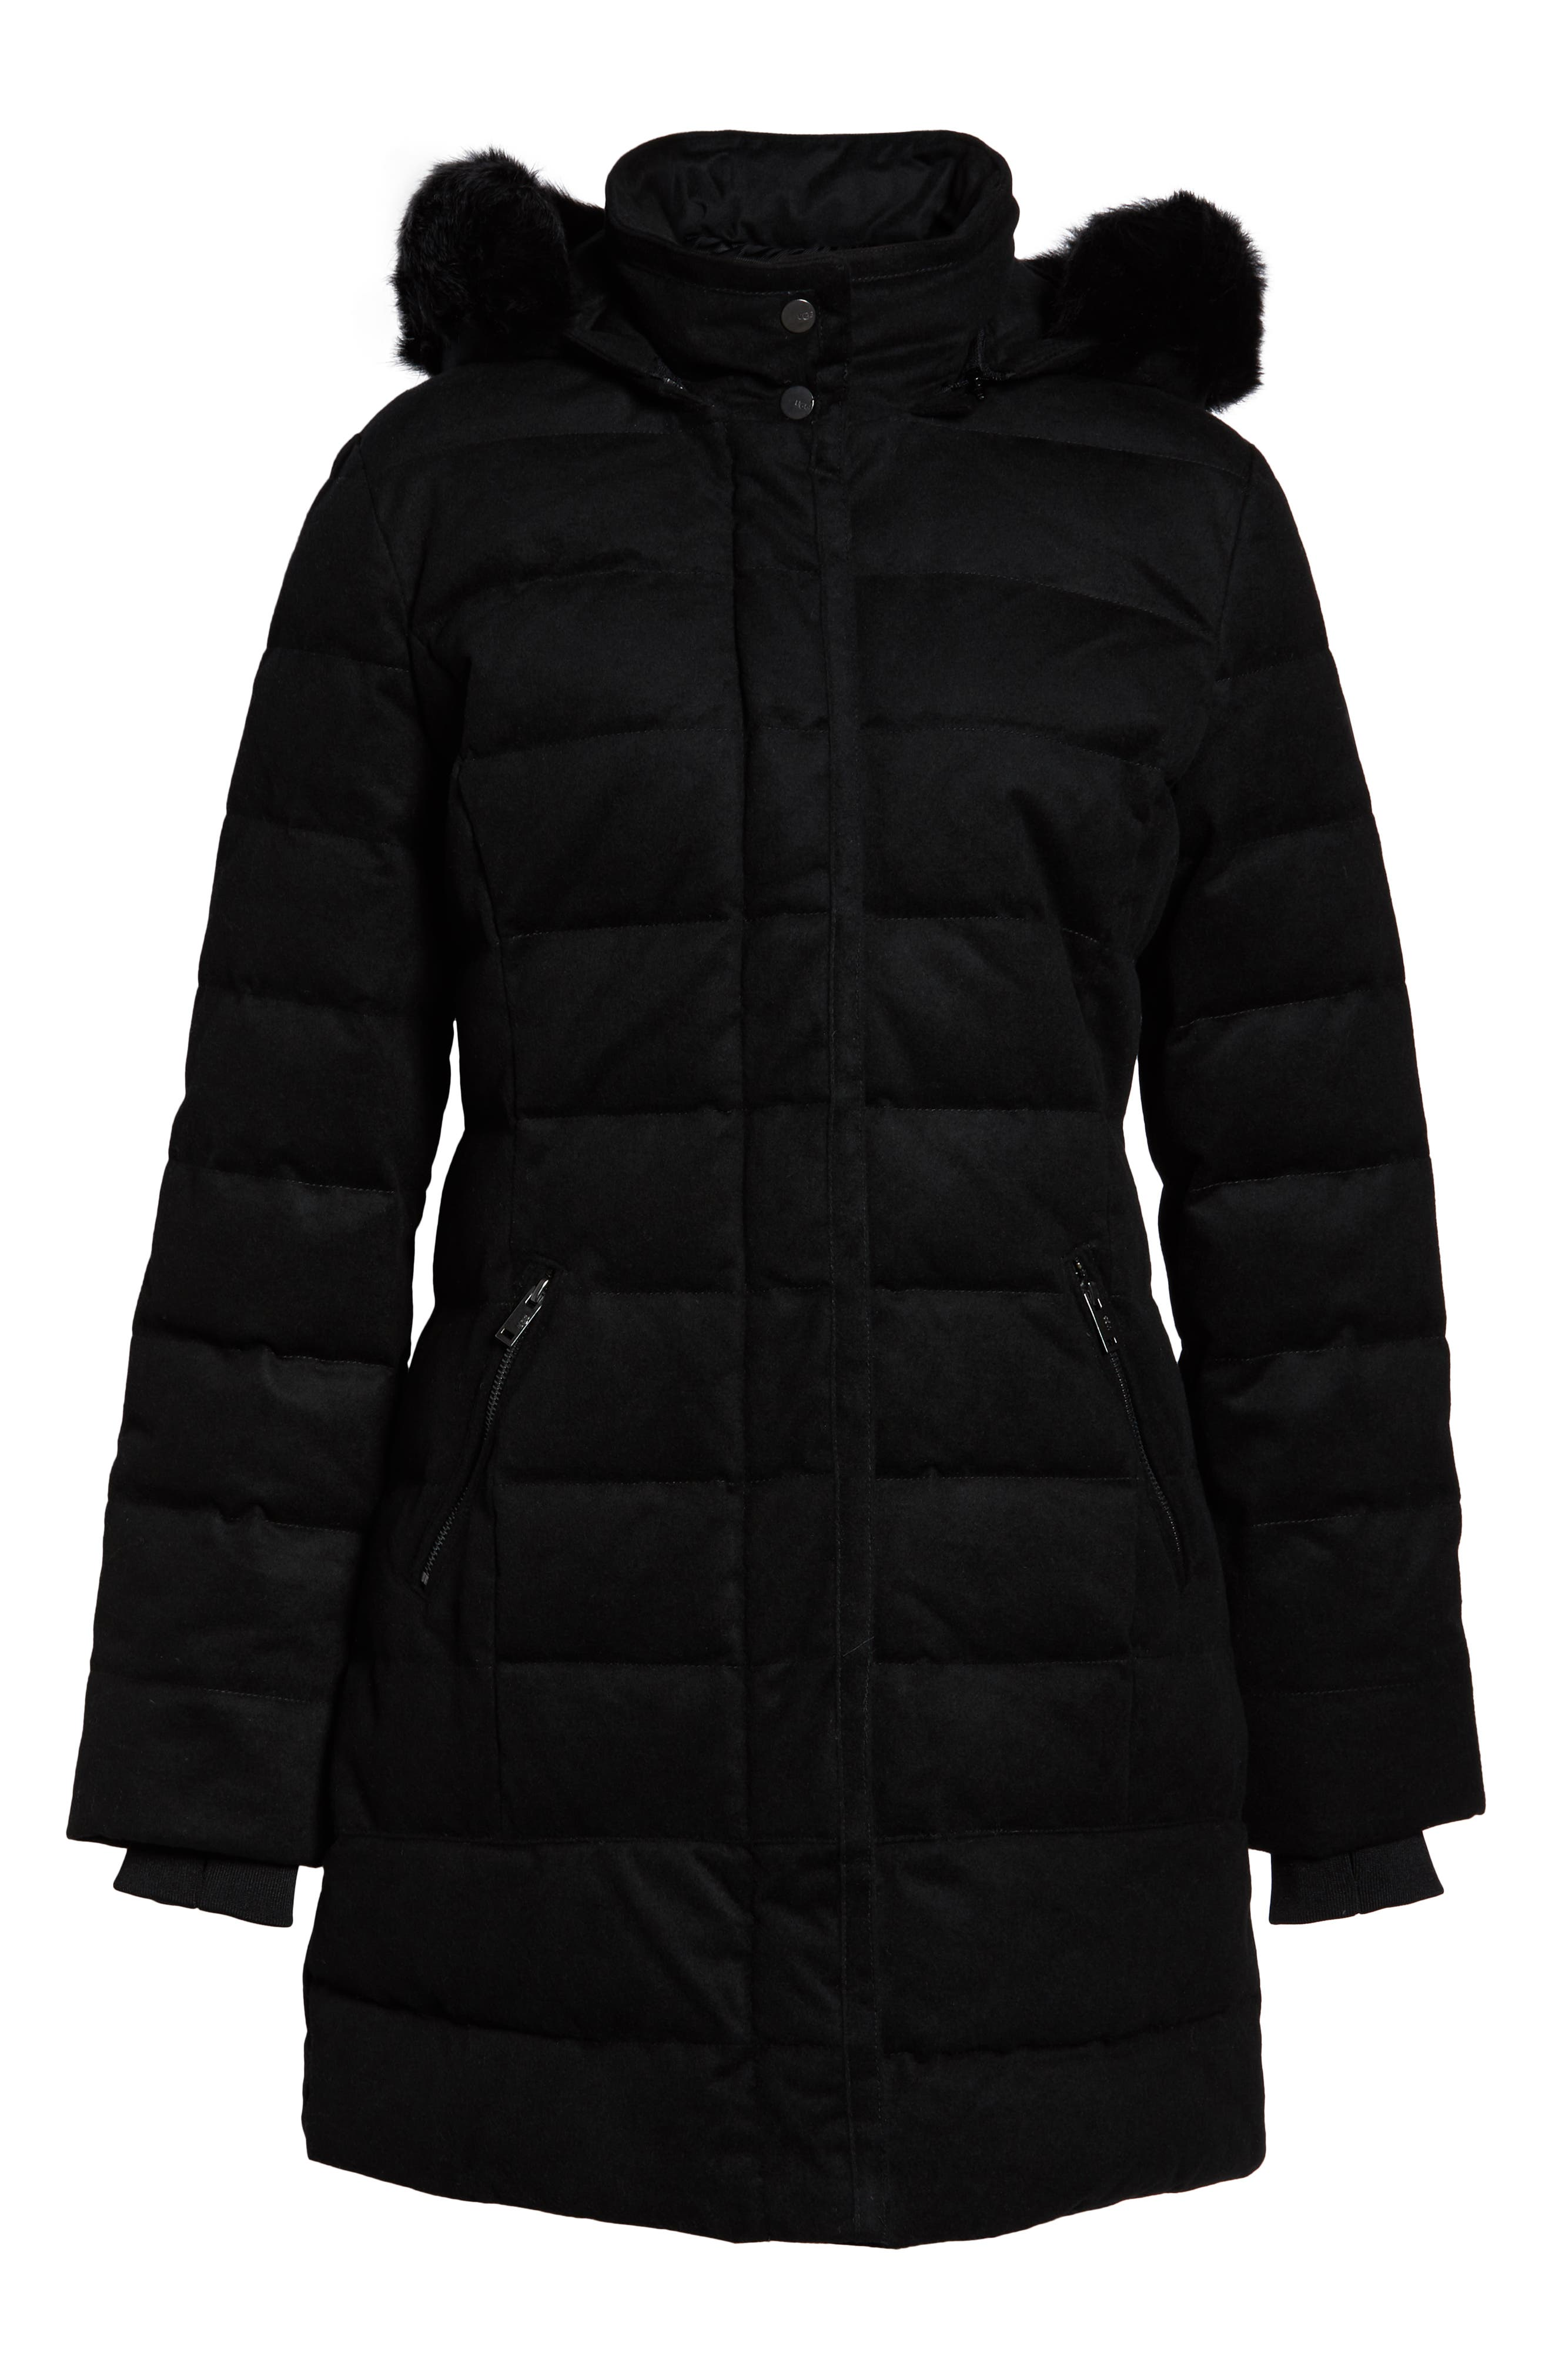 Celeste Genuine Shearling Trim Down Coat,                             Alternate thumbnail 6, color,                             BLACK